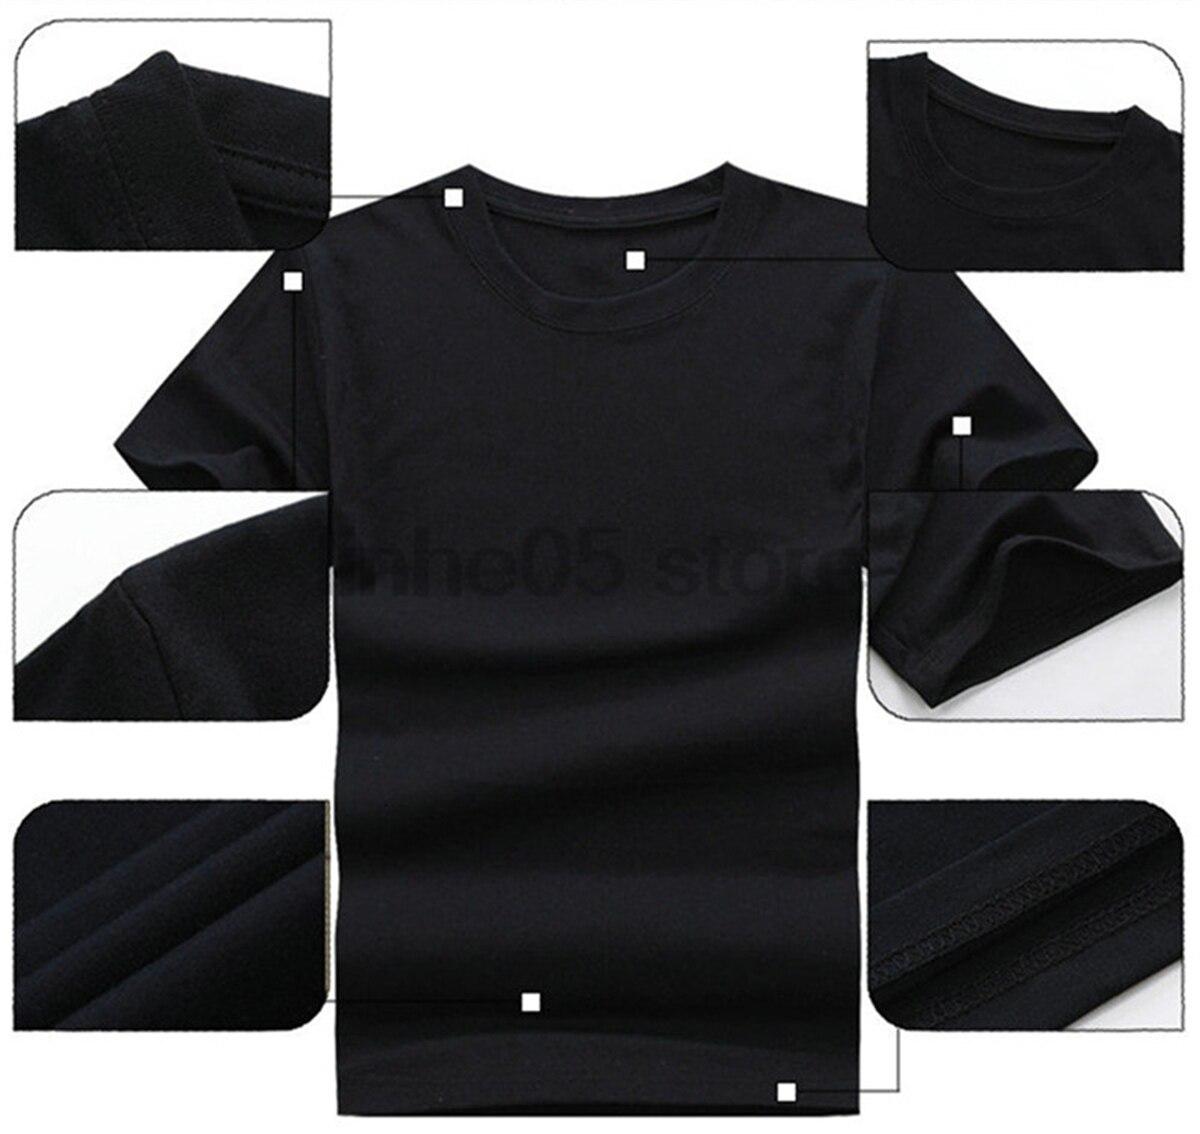 GILDAN Womens The Best Kind Of Mom Raises A Runner Tshirt Mother Day Gifts Womens T-shirt